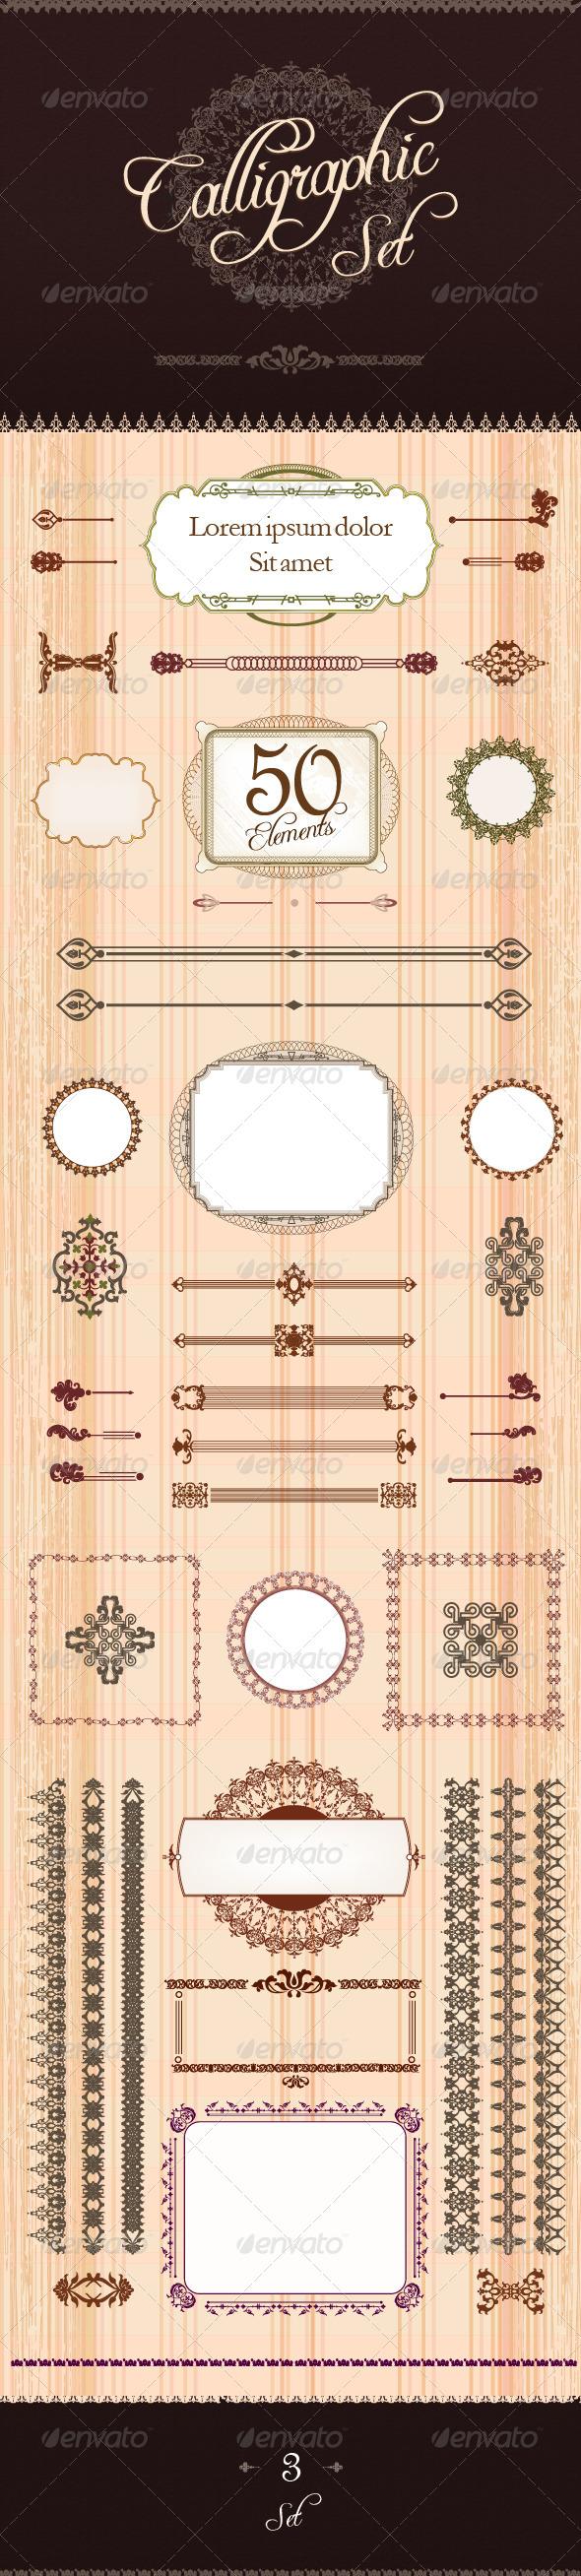 Calligraphic Design Set 3 - Flourishes / Swirls Decorative